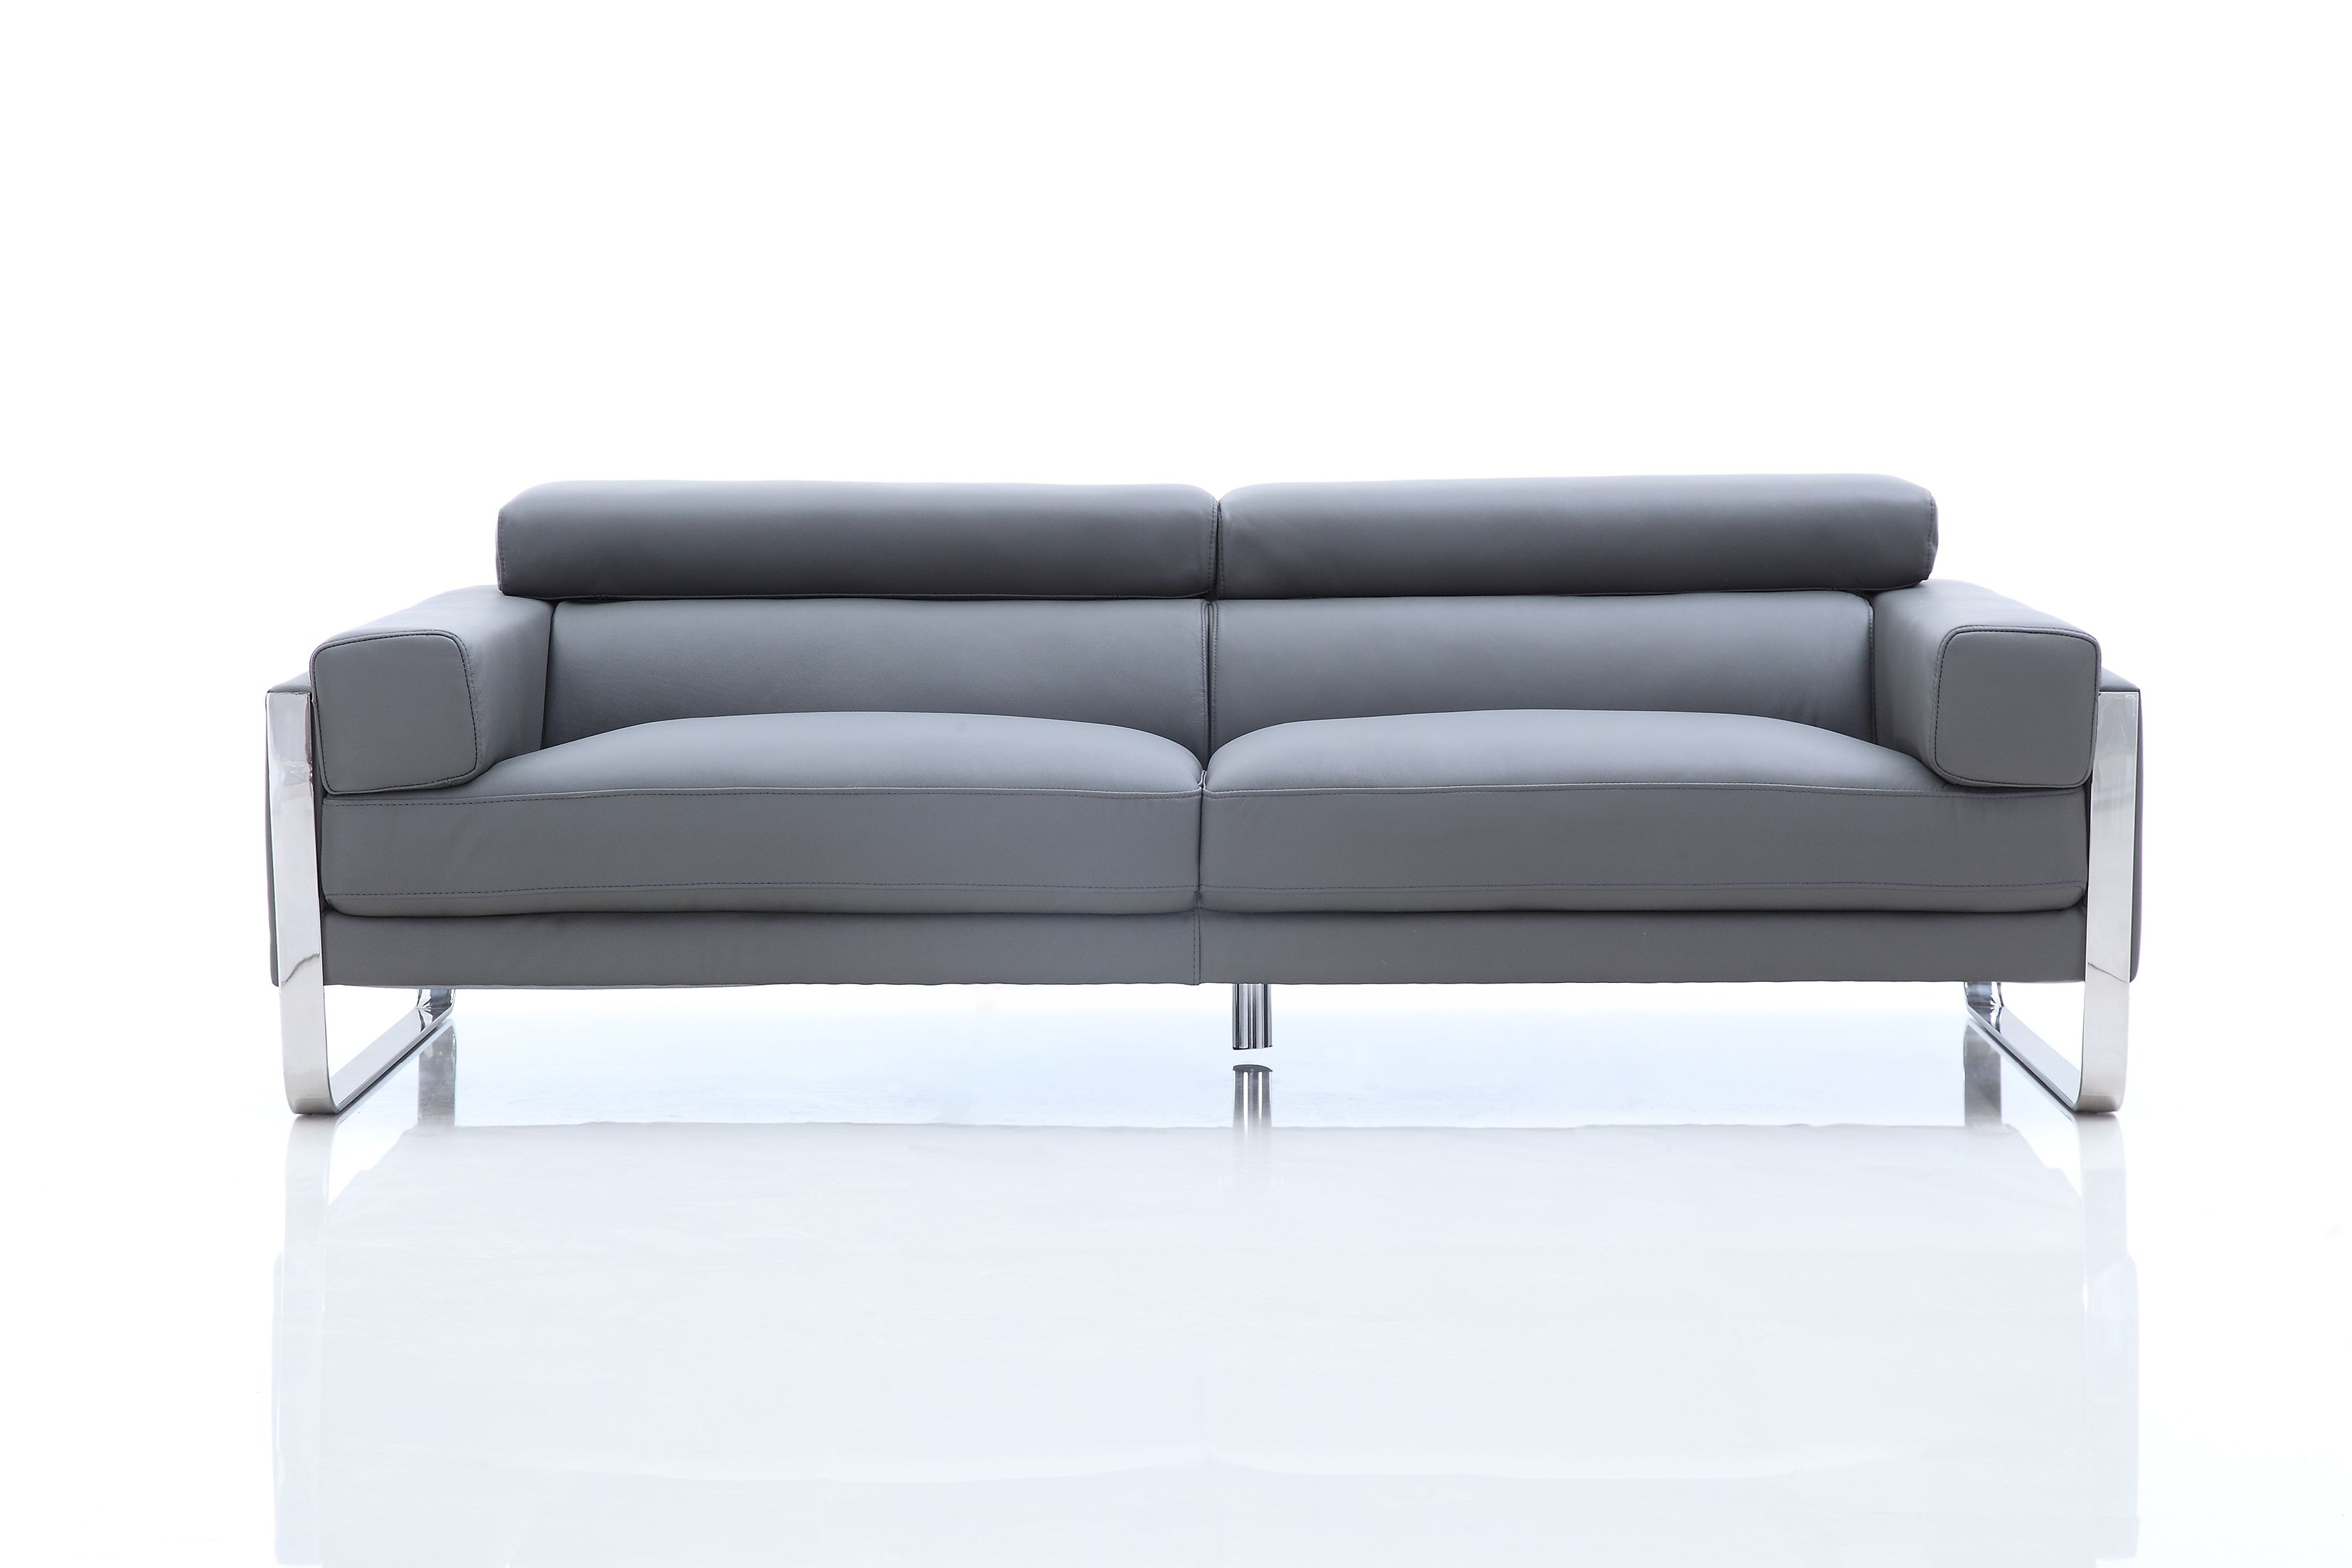 Juliett Sofa Italian Furniture Stores Sofa Design Leather Sofa